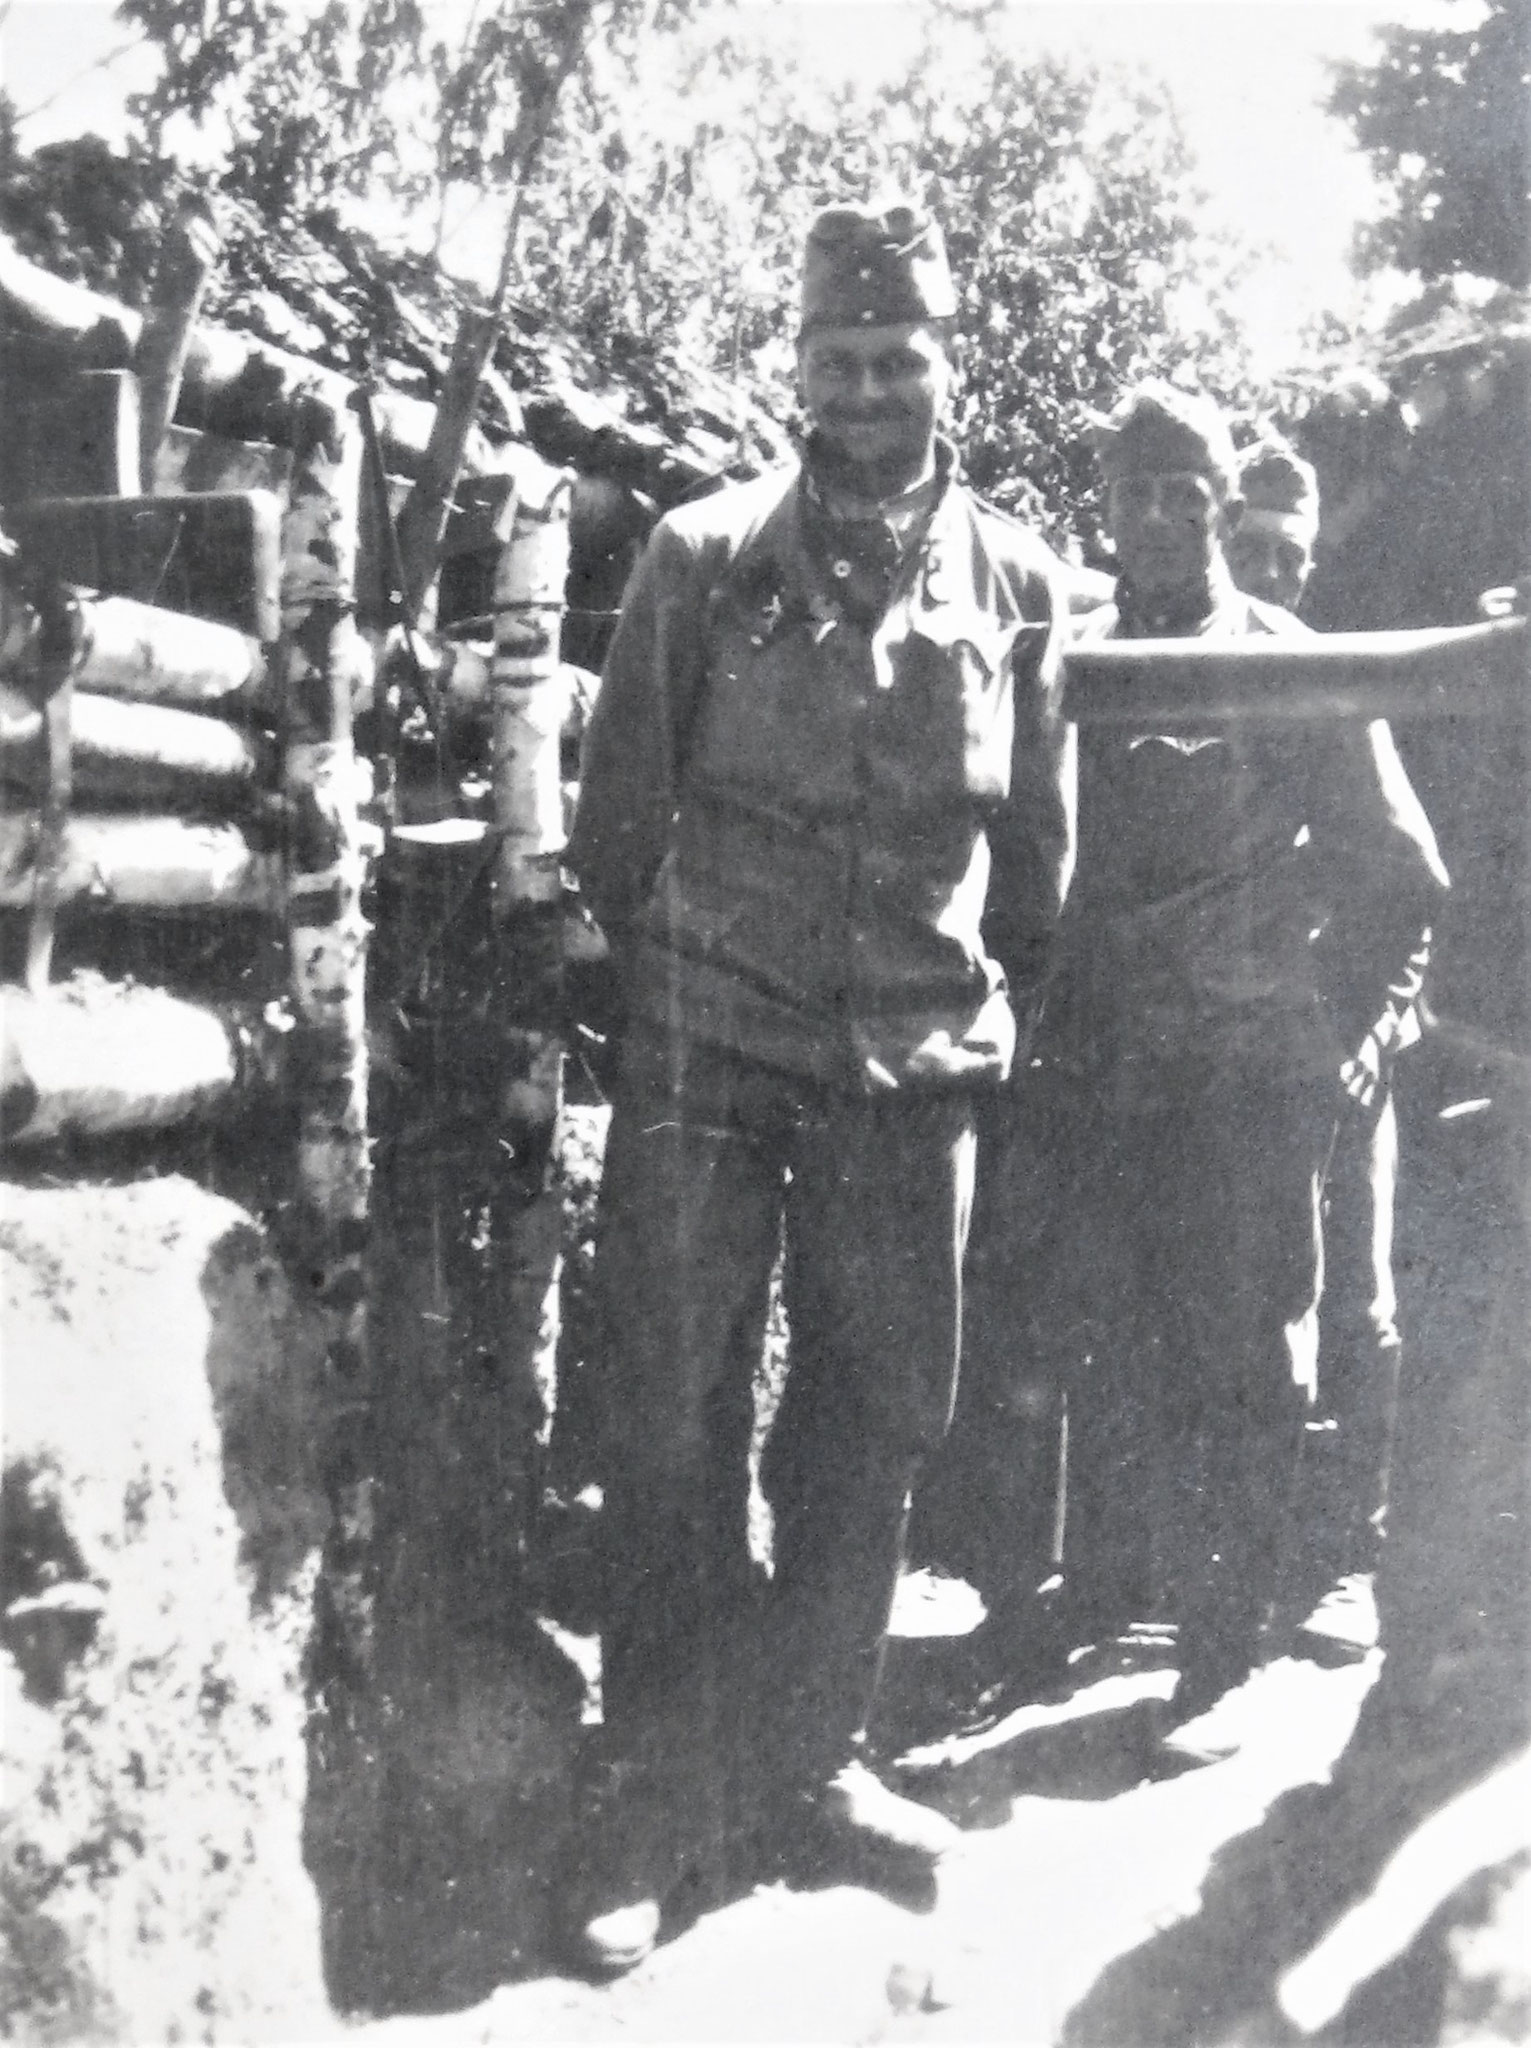 Zgfr Fauland, 3. Zug der 3. Eskadron.